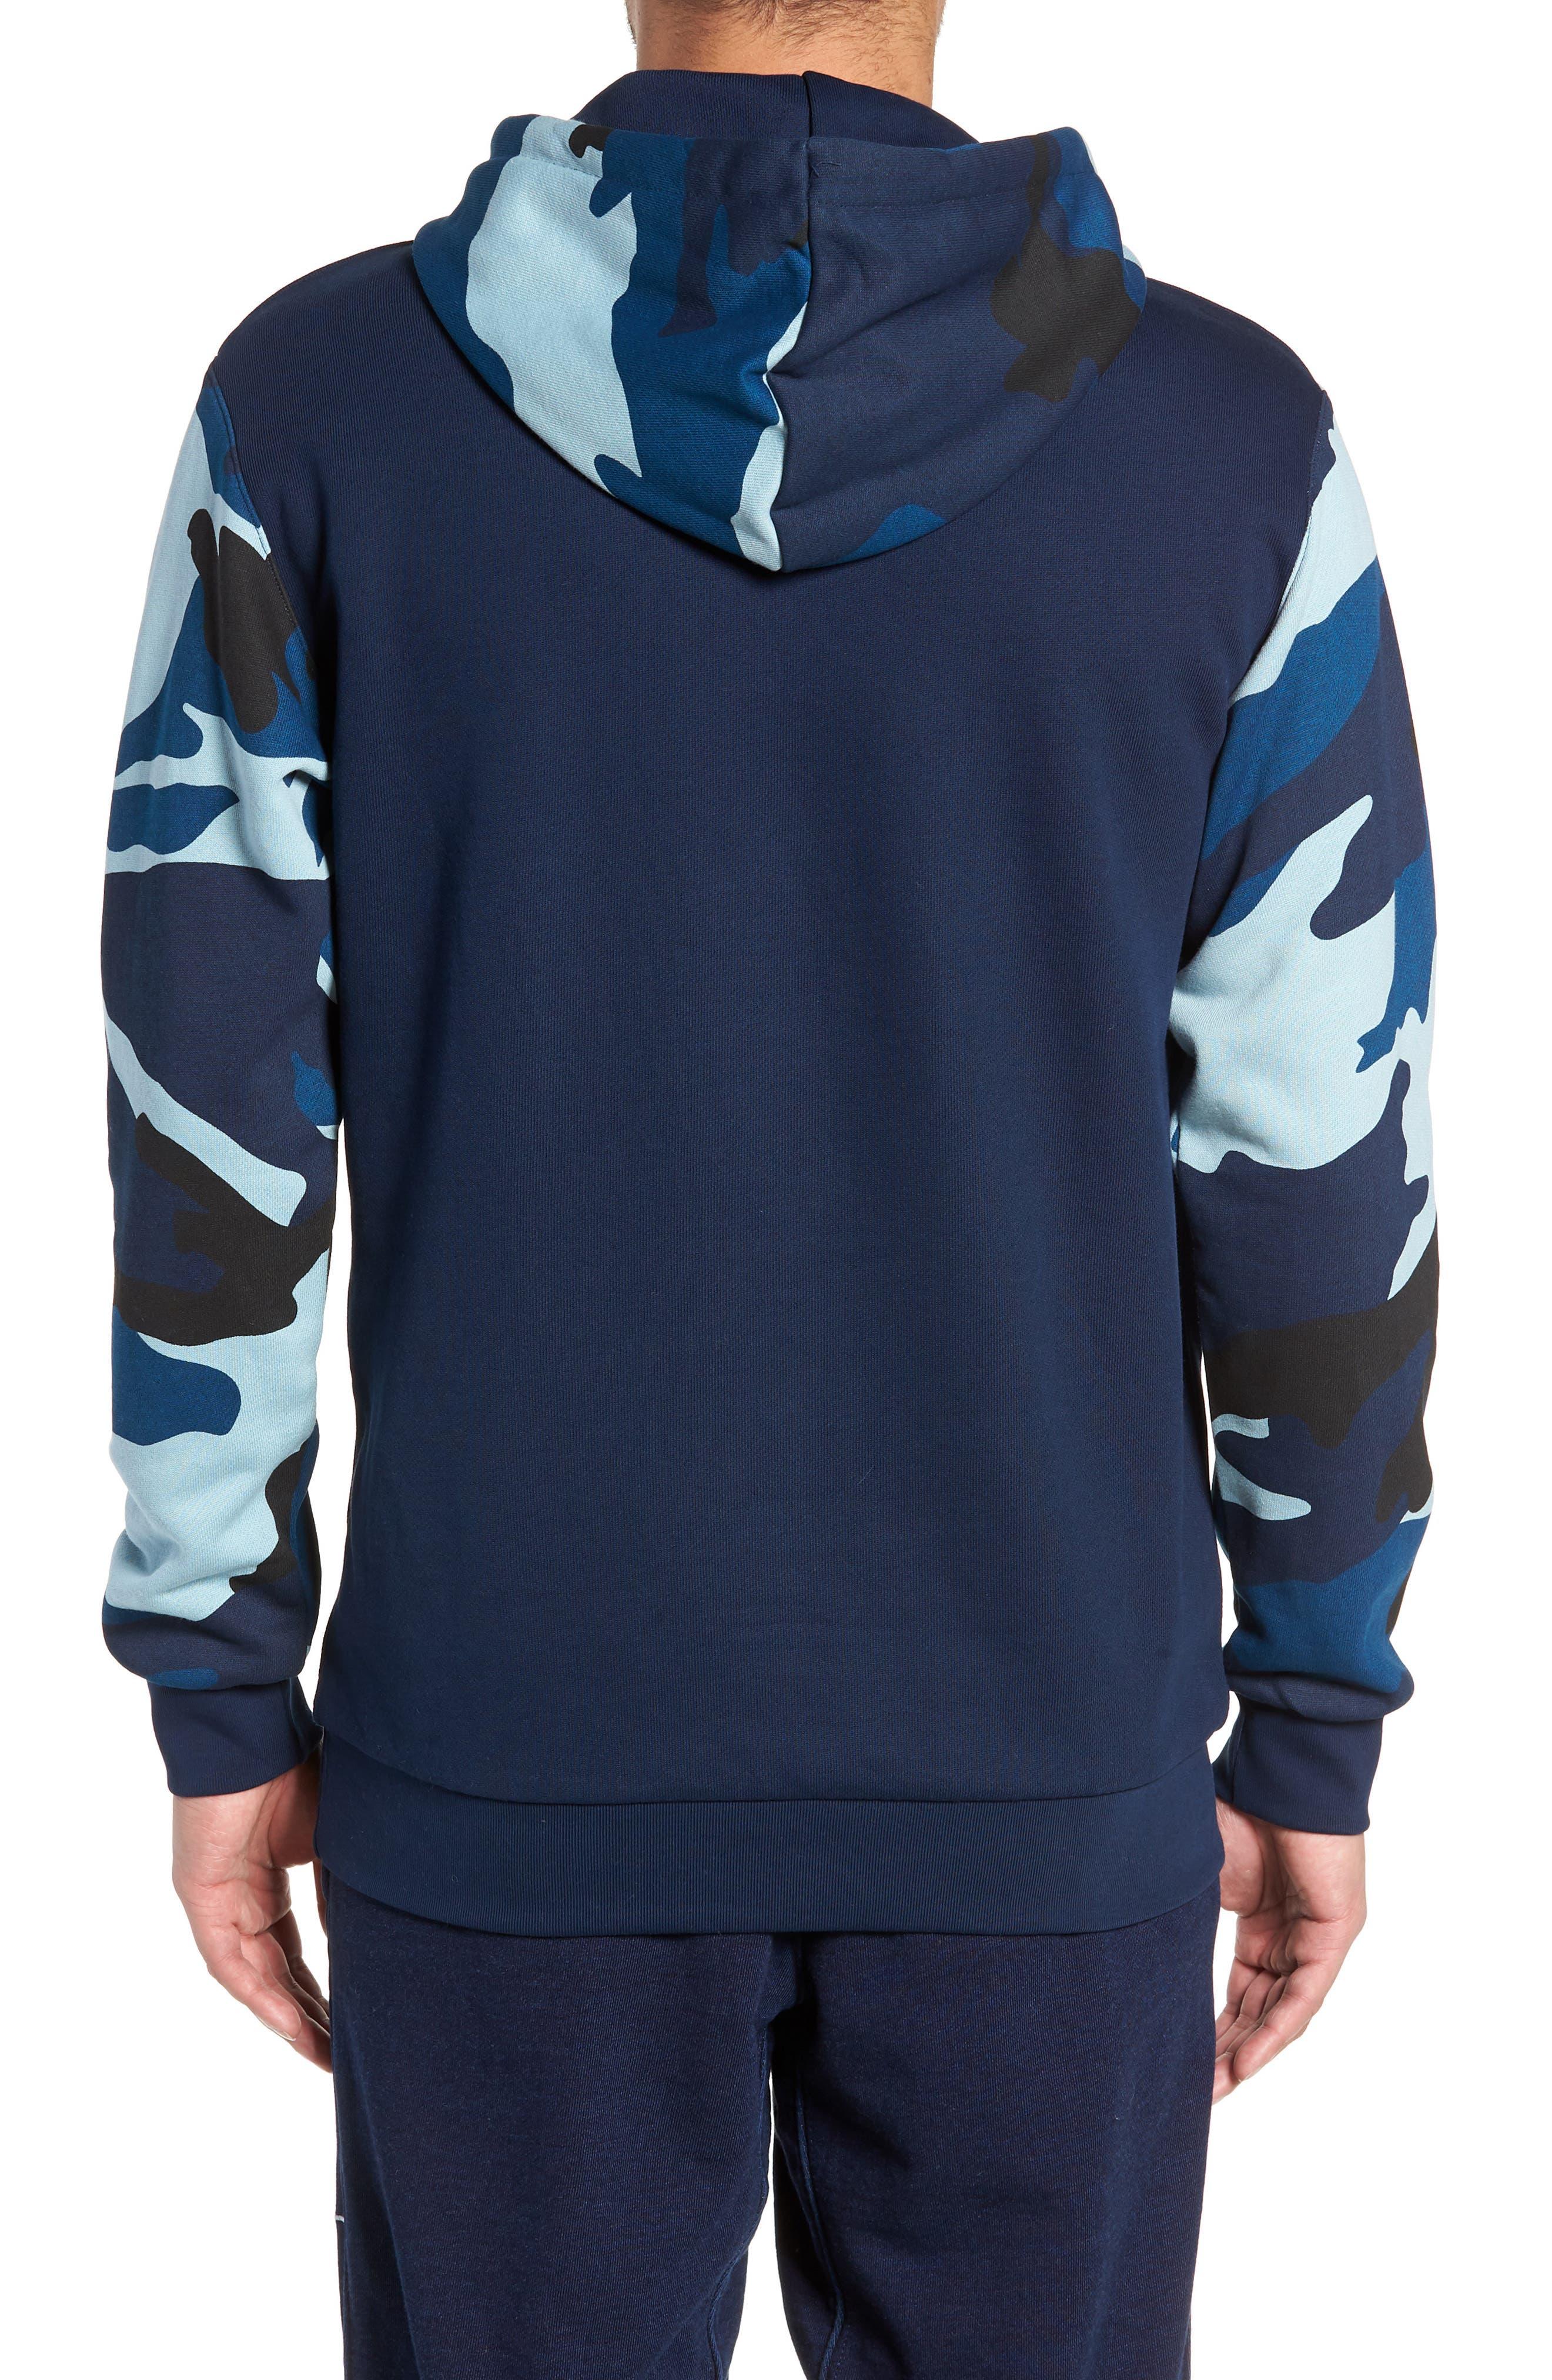 ADIDAS ORIGINALS, Camo Hooded Sweatshirt, Alternate thumbnail 2, color, COLLEGIATE NAVY